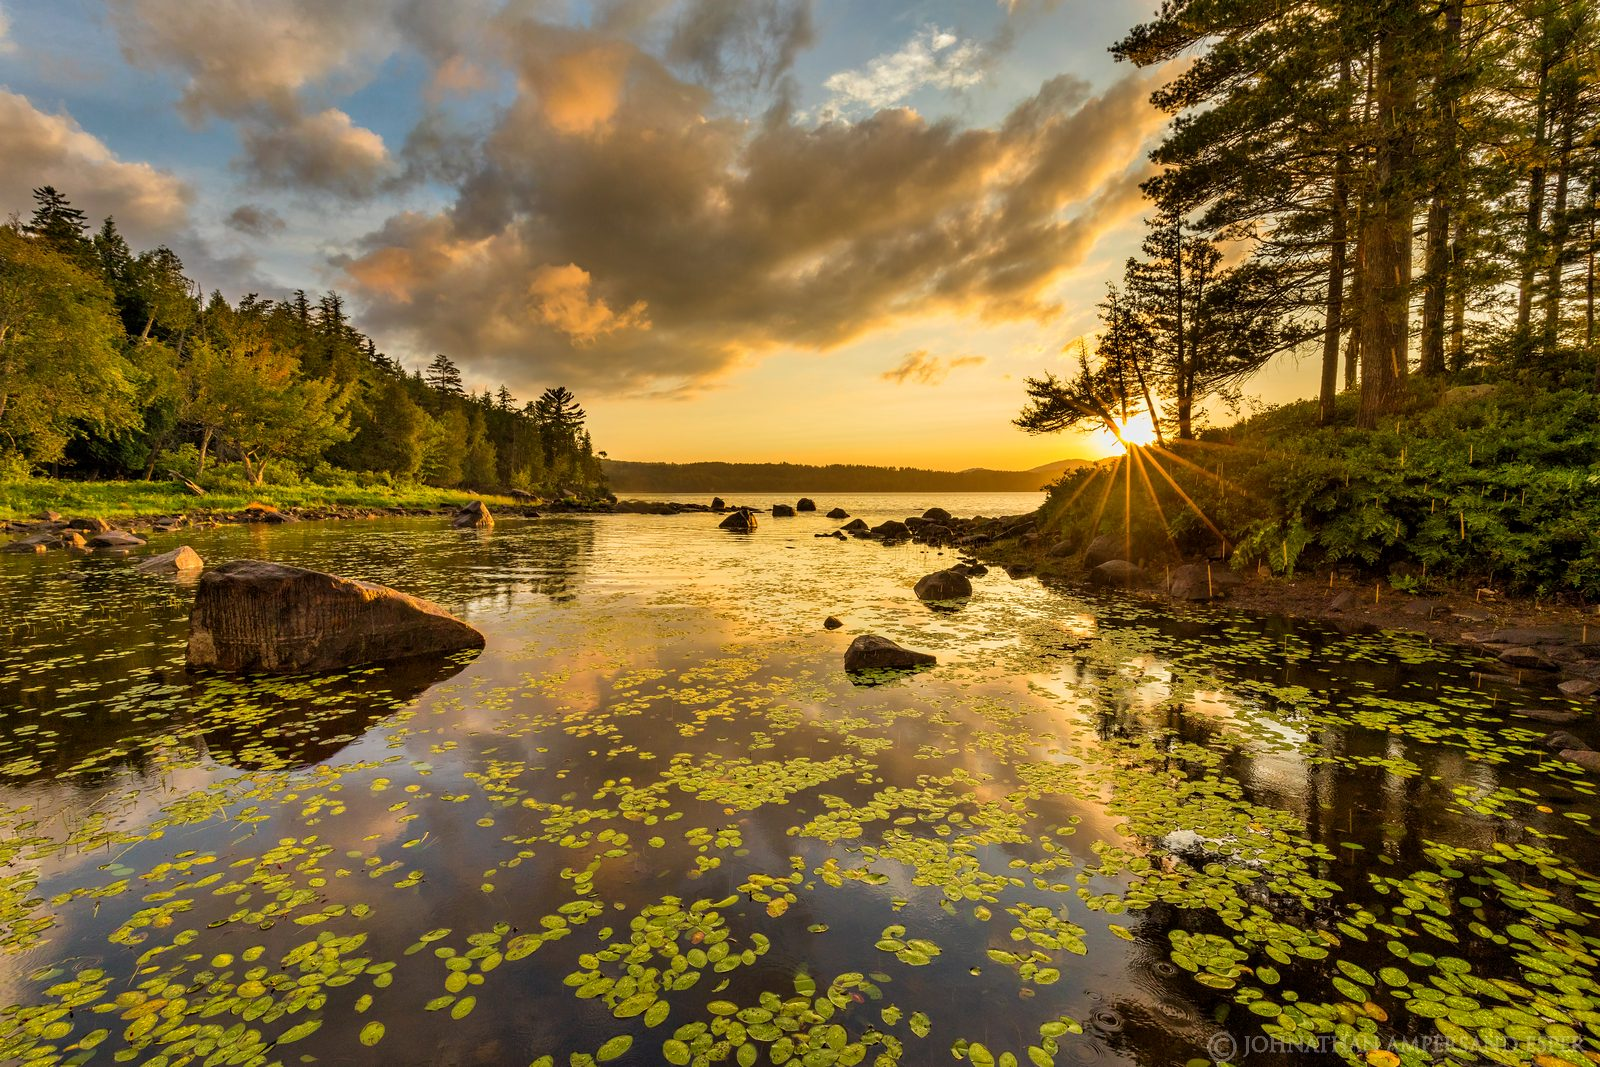 Long Lake,camping,camping trip,Marie-Claude,summer,rain,raindrops,